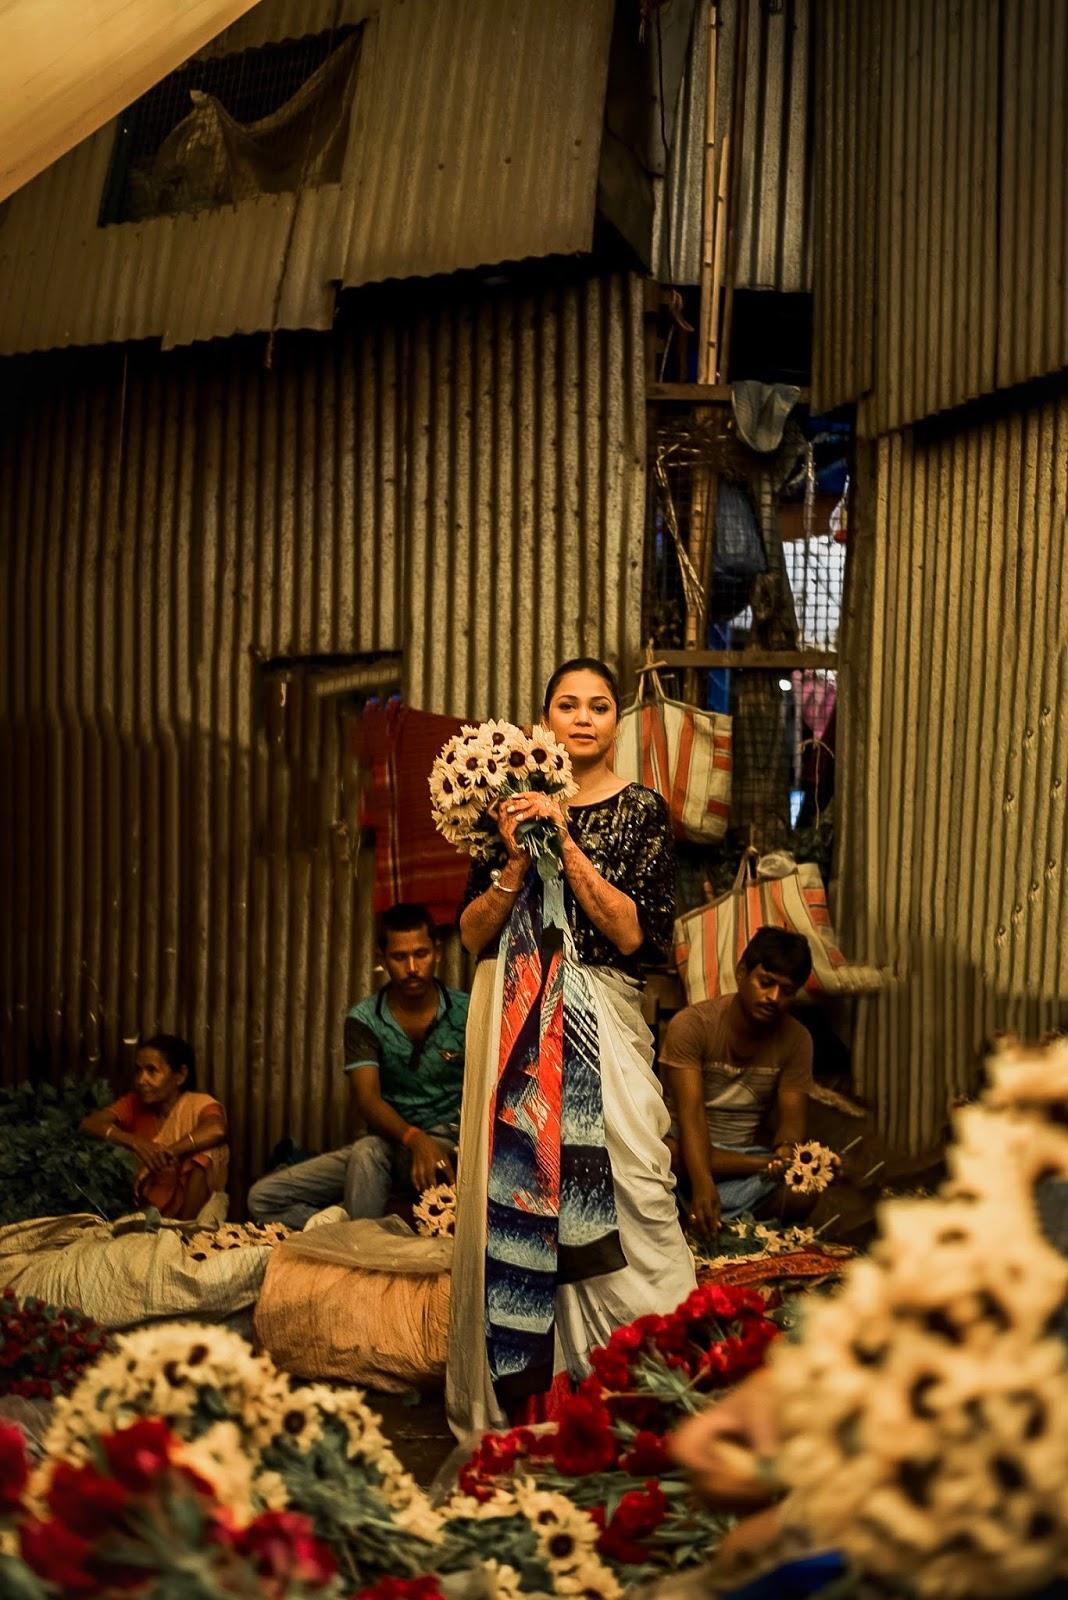 Things to do in Kolkata, trip to india, travel itinerary for Kolkata, durga puja in Kolkata, festive, travel, myriad musings